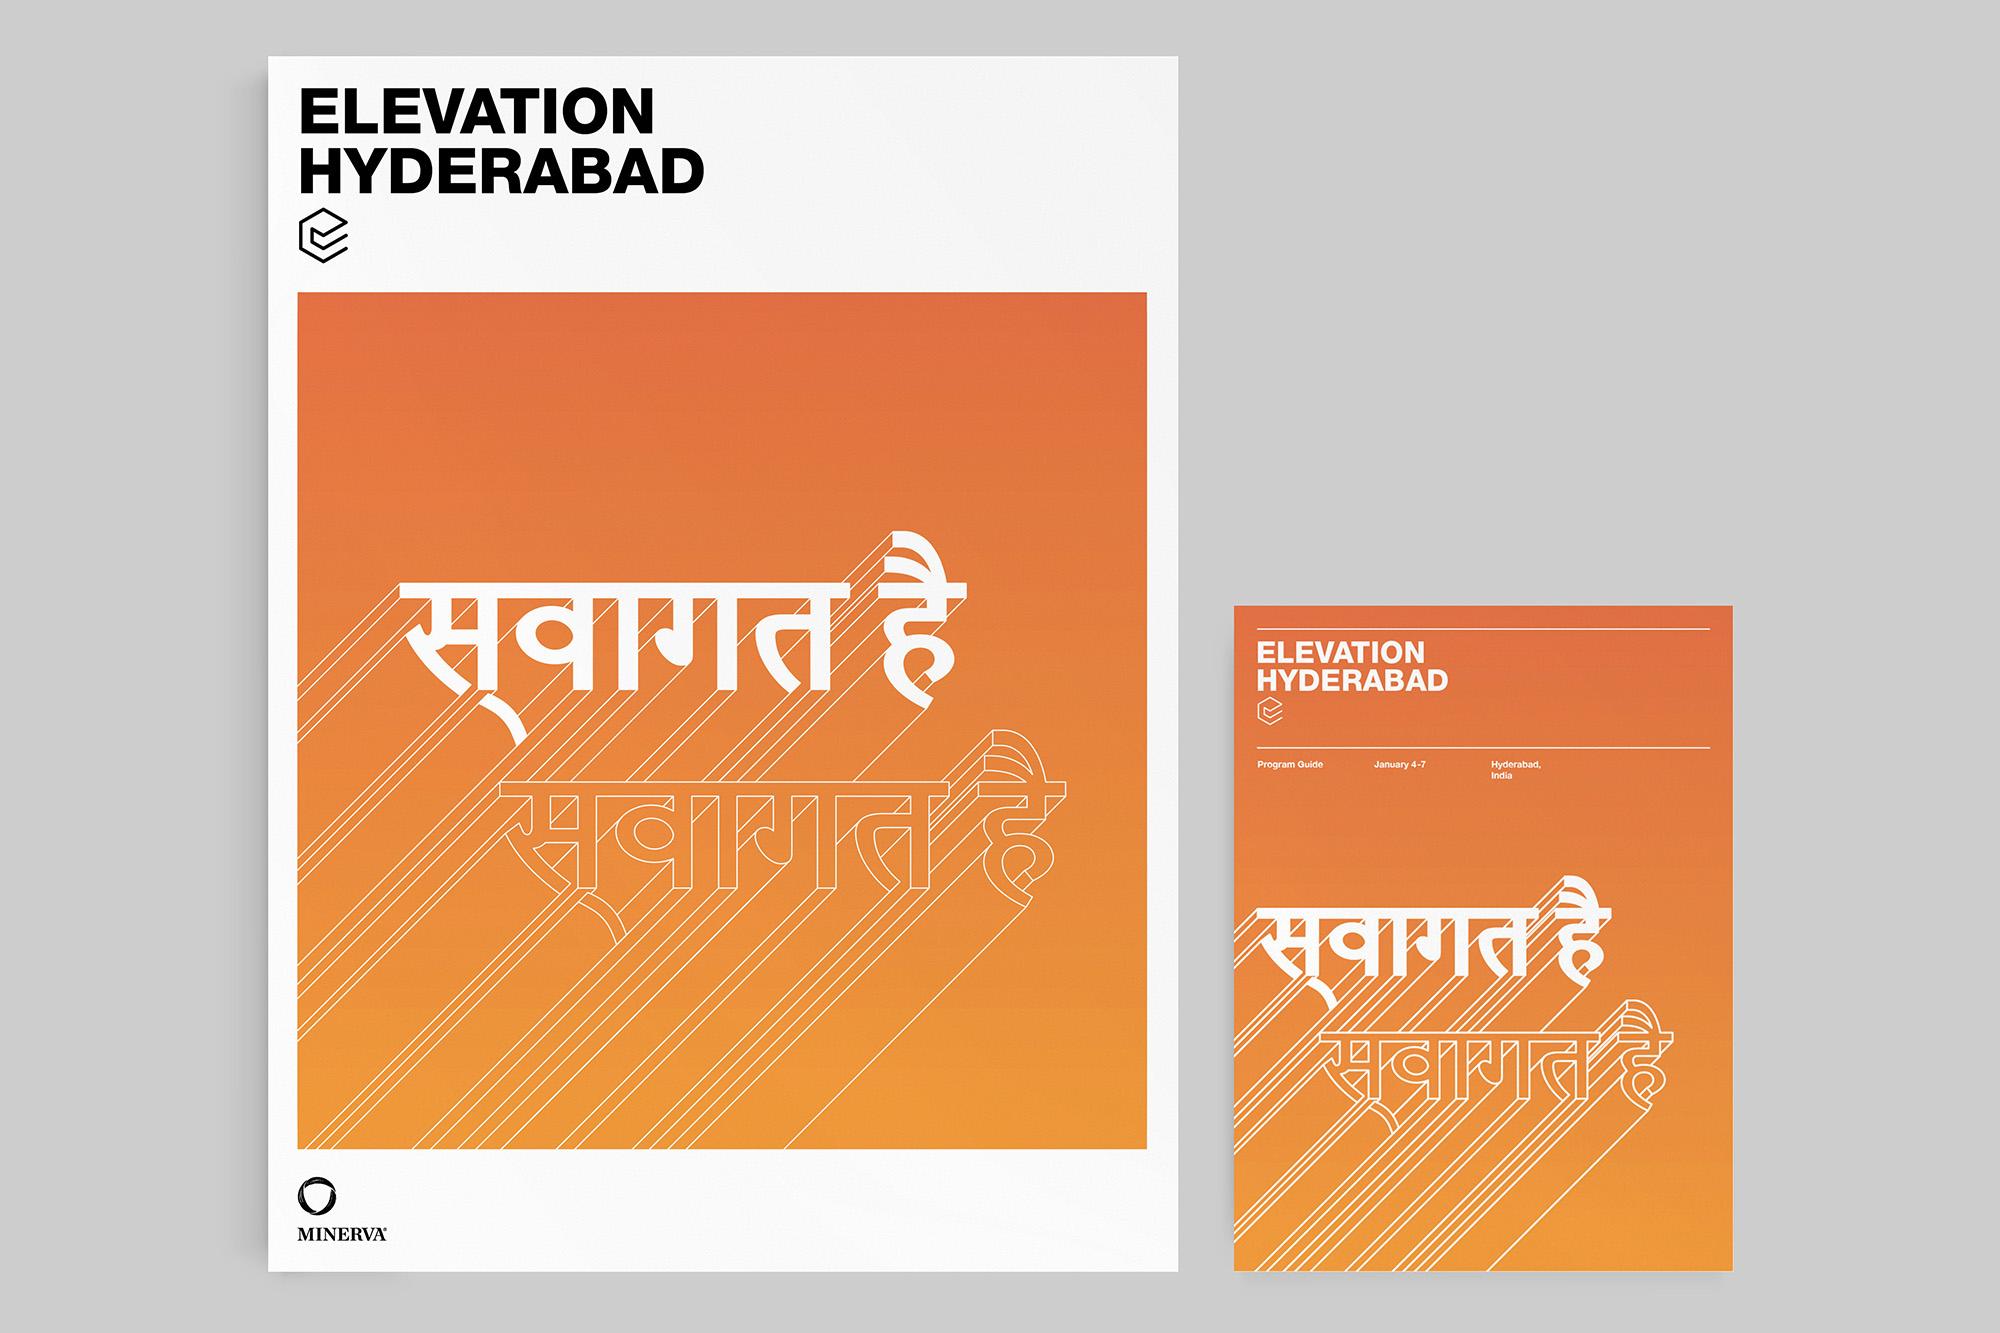 Elevation_Hyderabad_poster_program